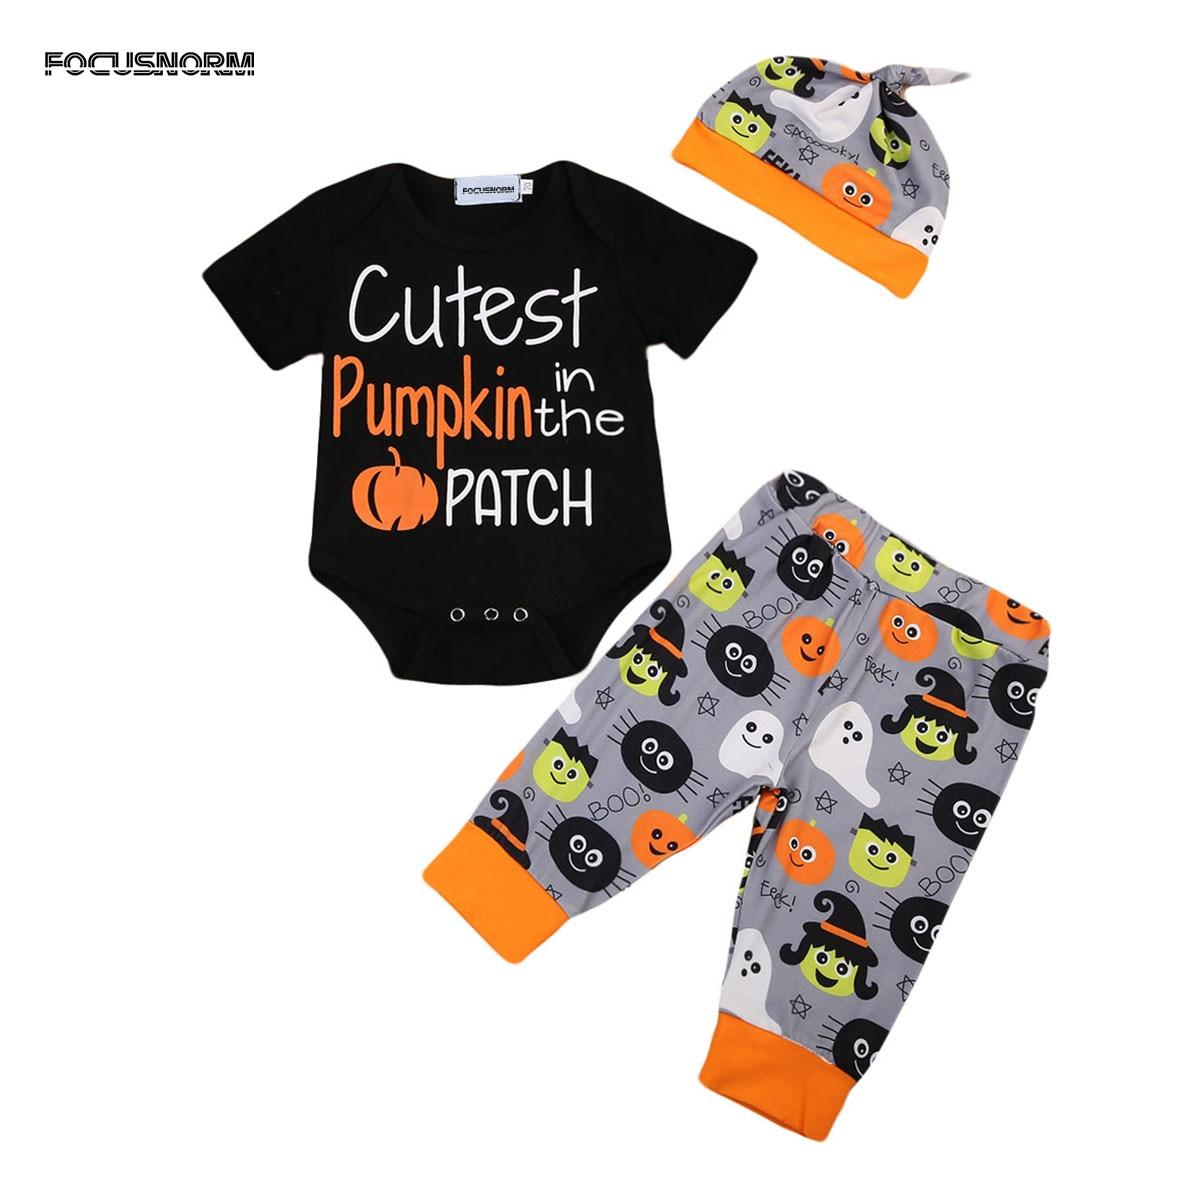 3PCS Set Newborn Baby Boy Girl Halloween Custest Pumpkin Short Sleeve Clothes Black Romper Cartoon Pattern Pants Hat Outfits